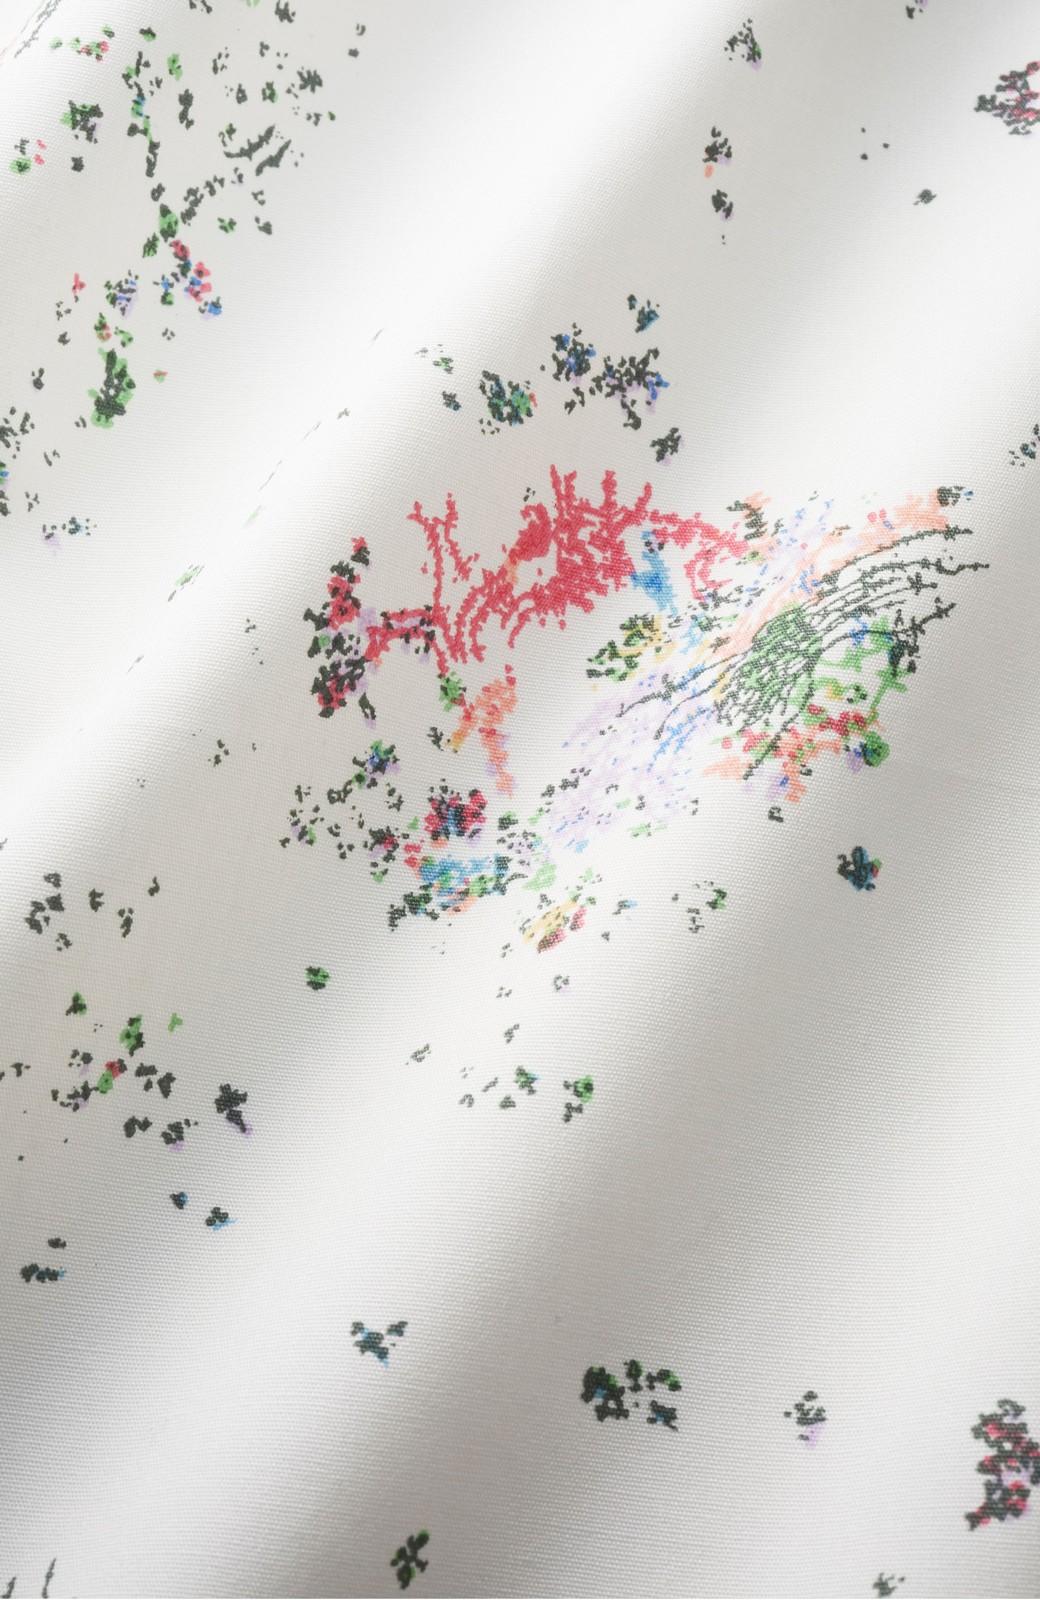 haco! UNICOLART SEII SATOSHI [世界] 華やぐゆったりワンピース  <ホワイト系その他>の商品写真2